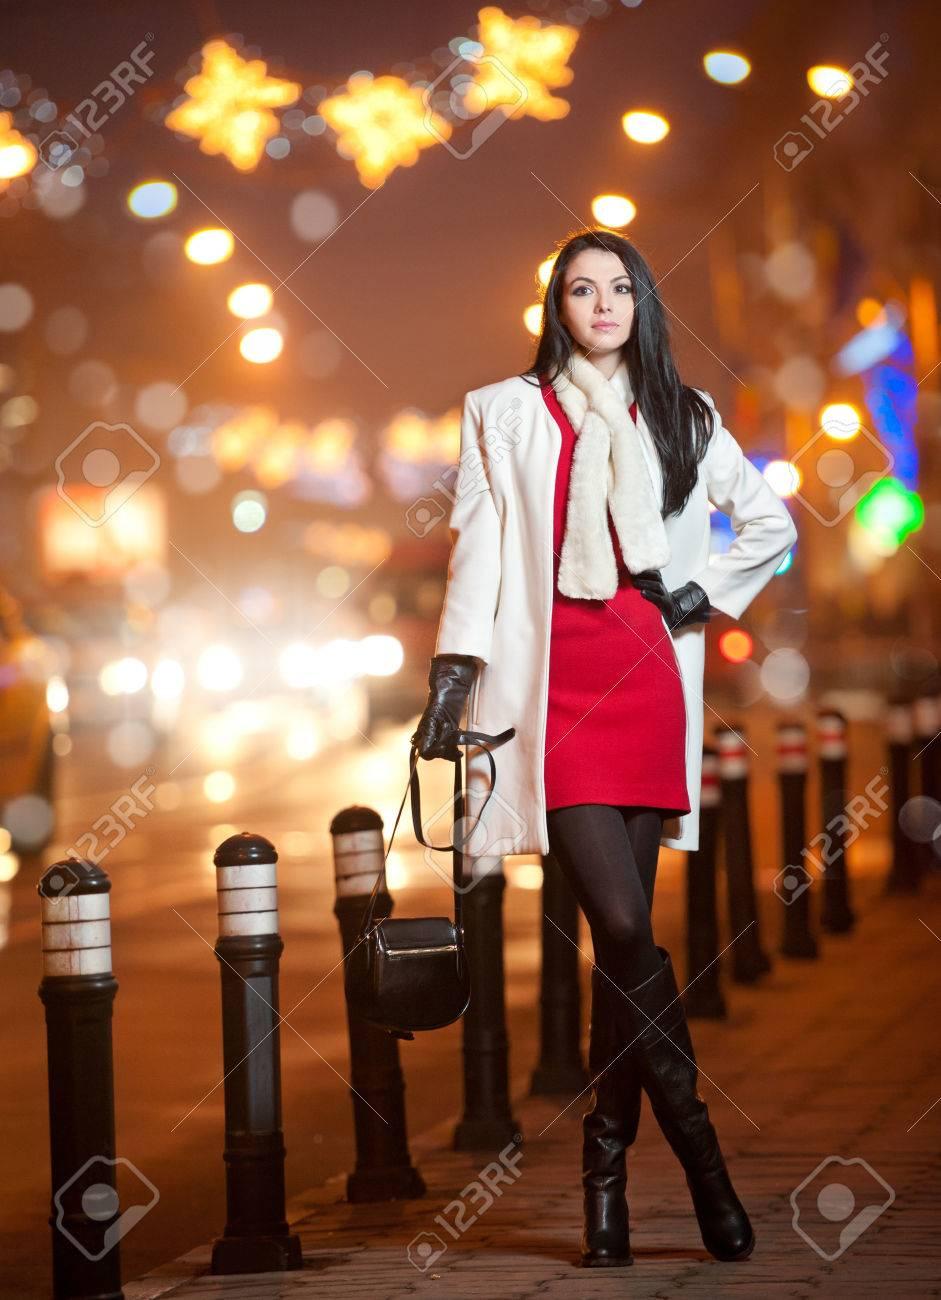 Vestido rojo con abrigo blanco